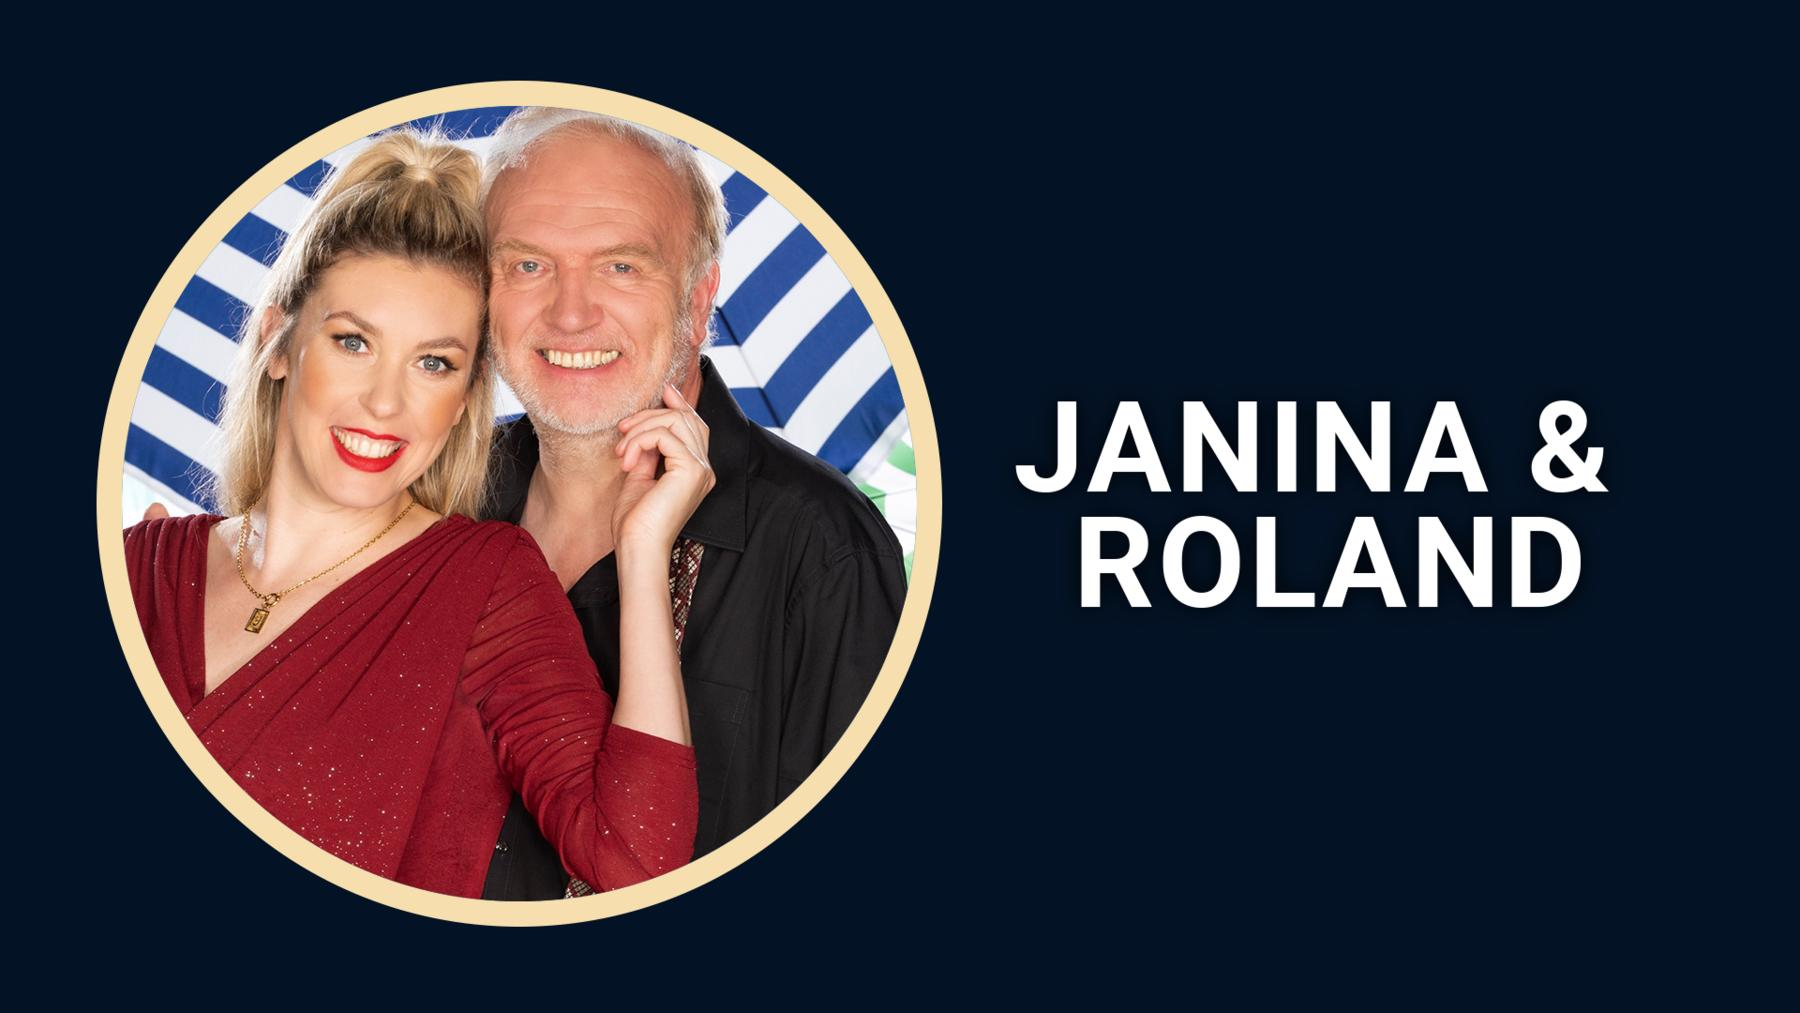 Janina & Roland